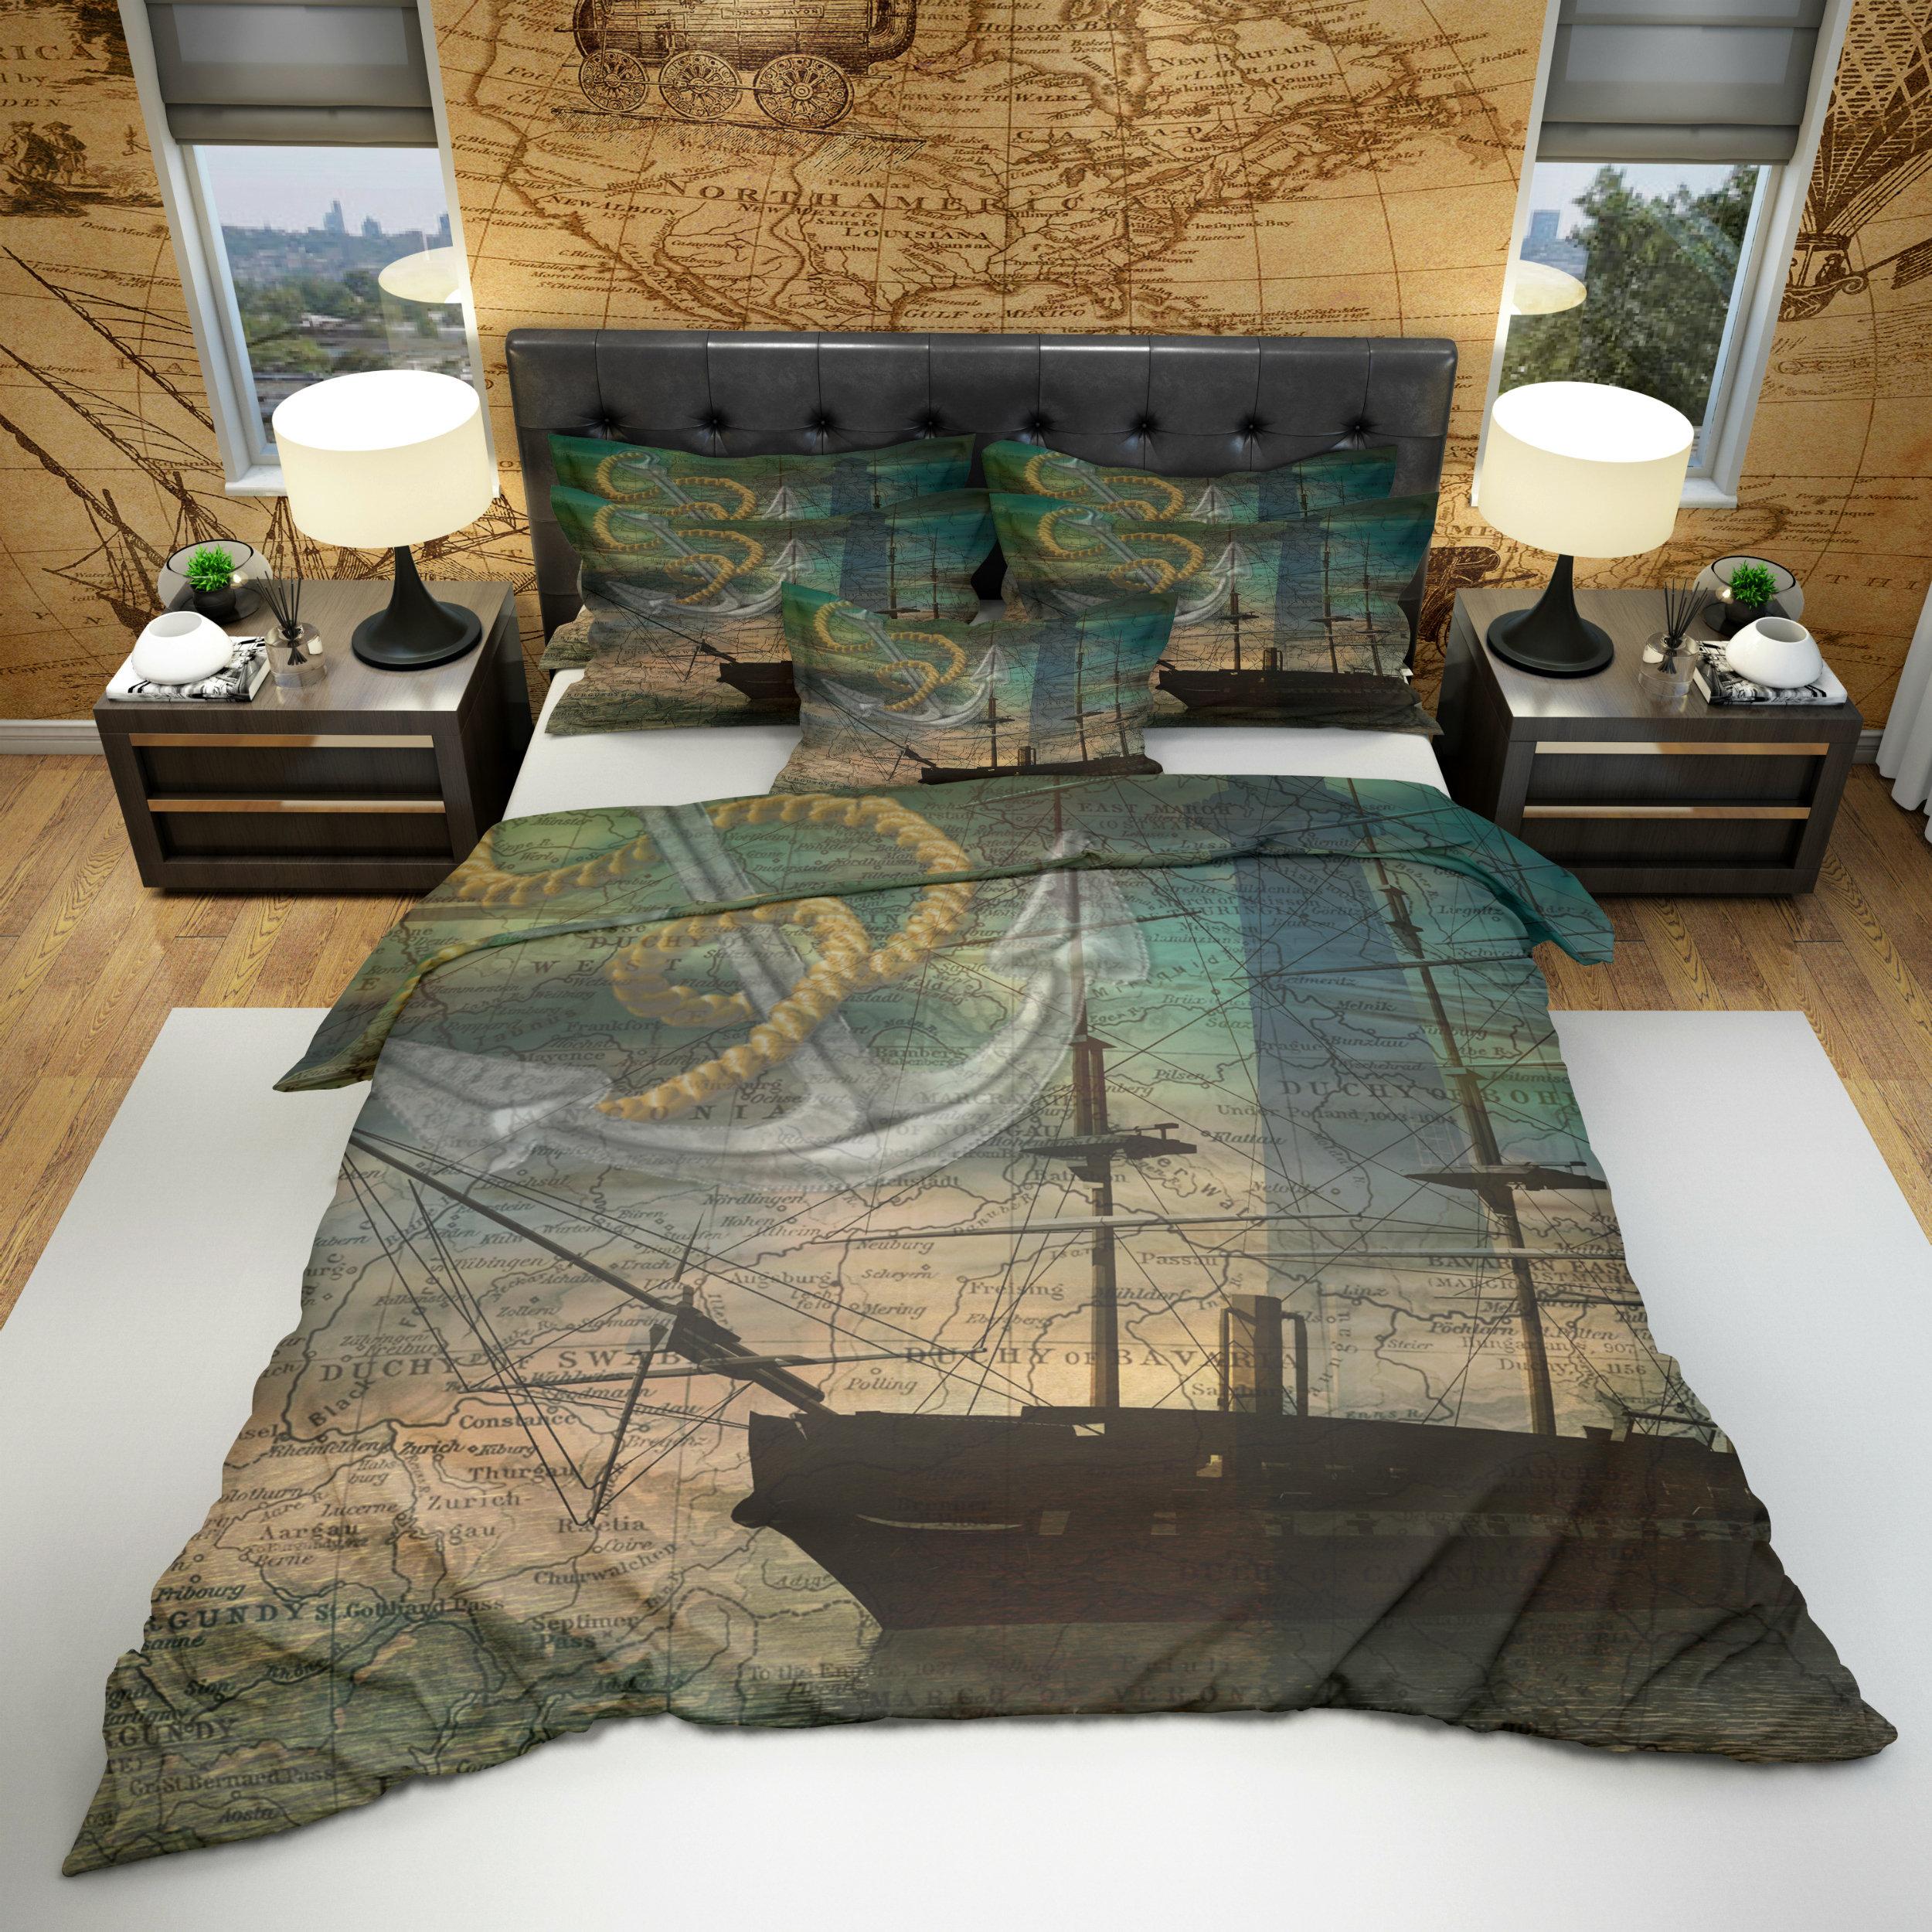 Vintage Nautical Bedding: Bedding Vintage Nautical Comforter Duvet Cover Optional